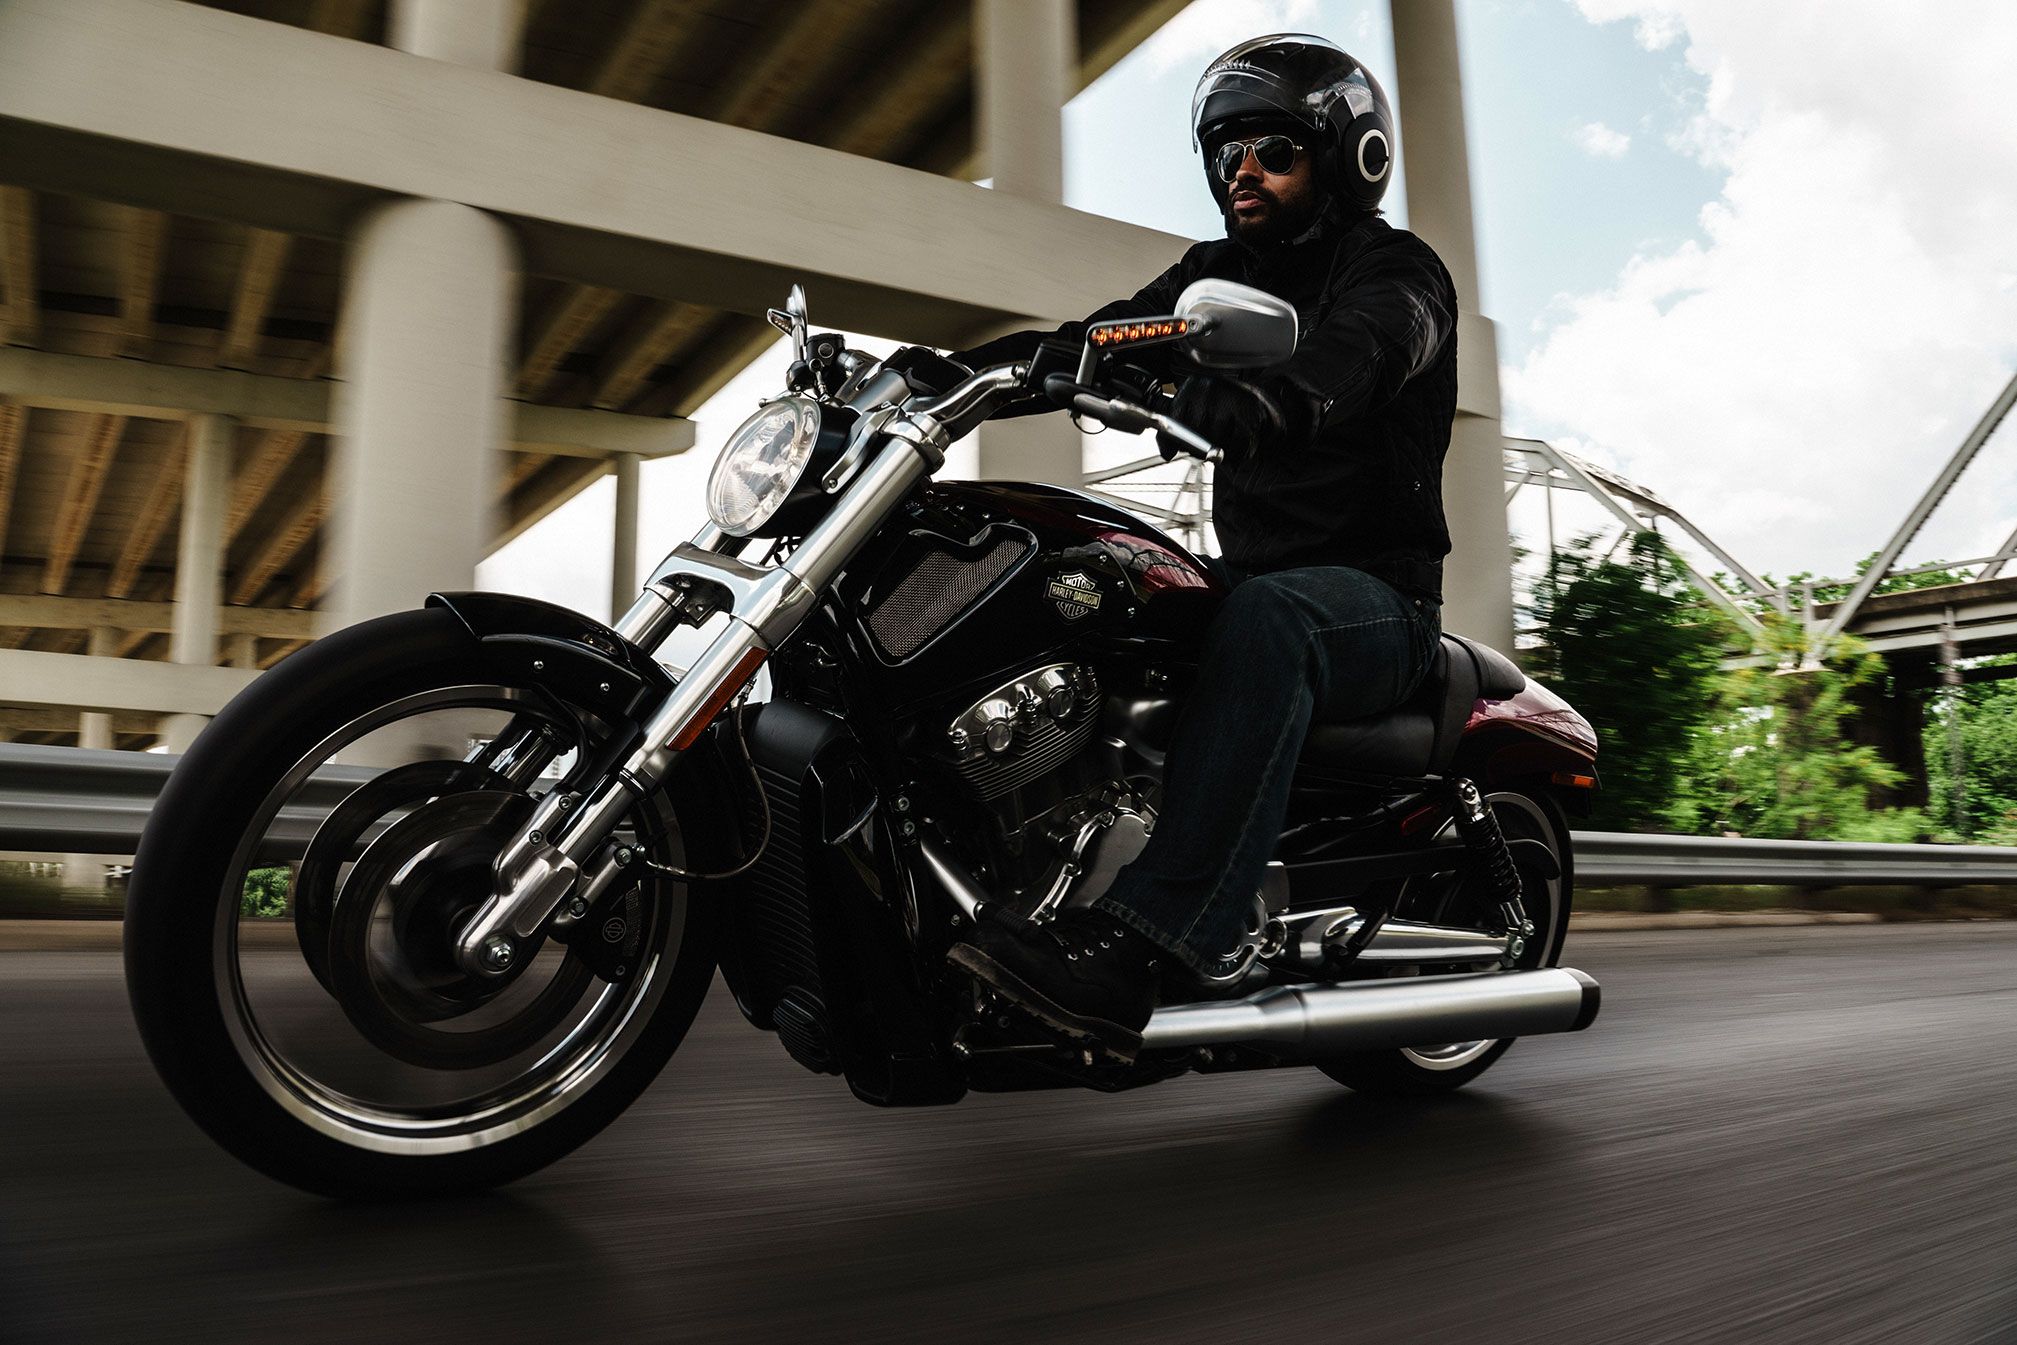 2017 Harley Davidson V Rod Muscle Fondo De Pantalla Hd